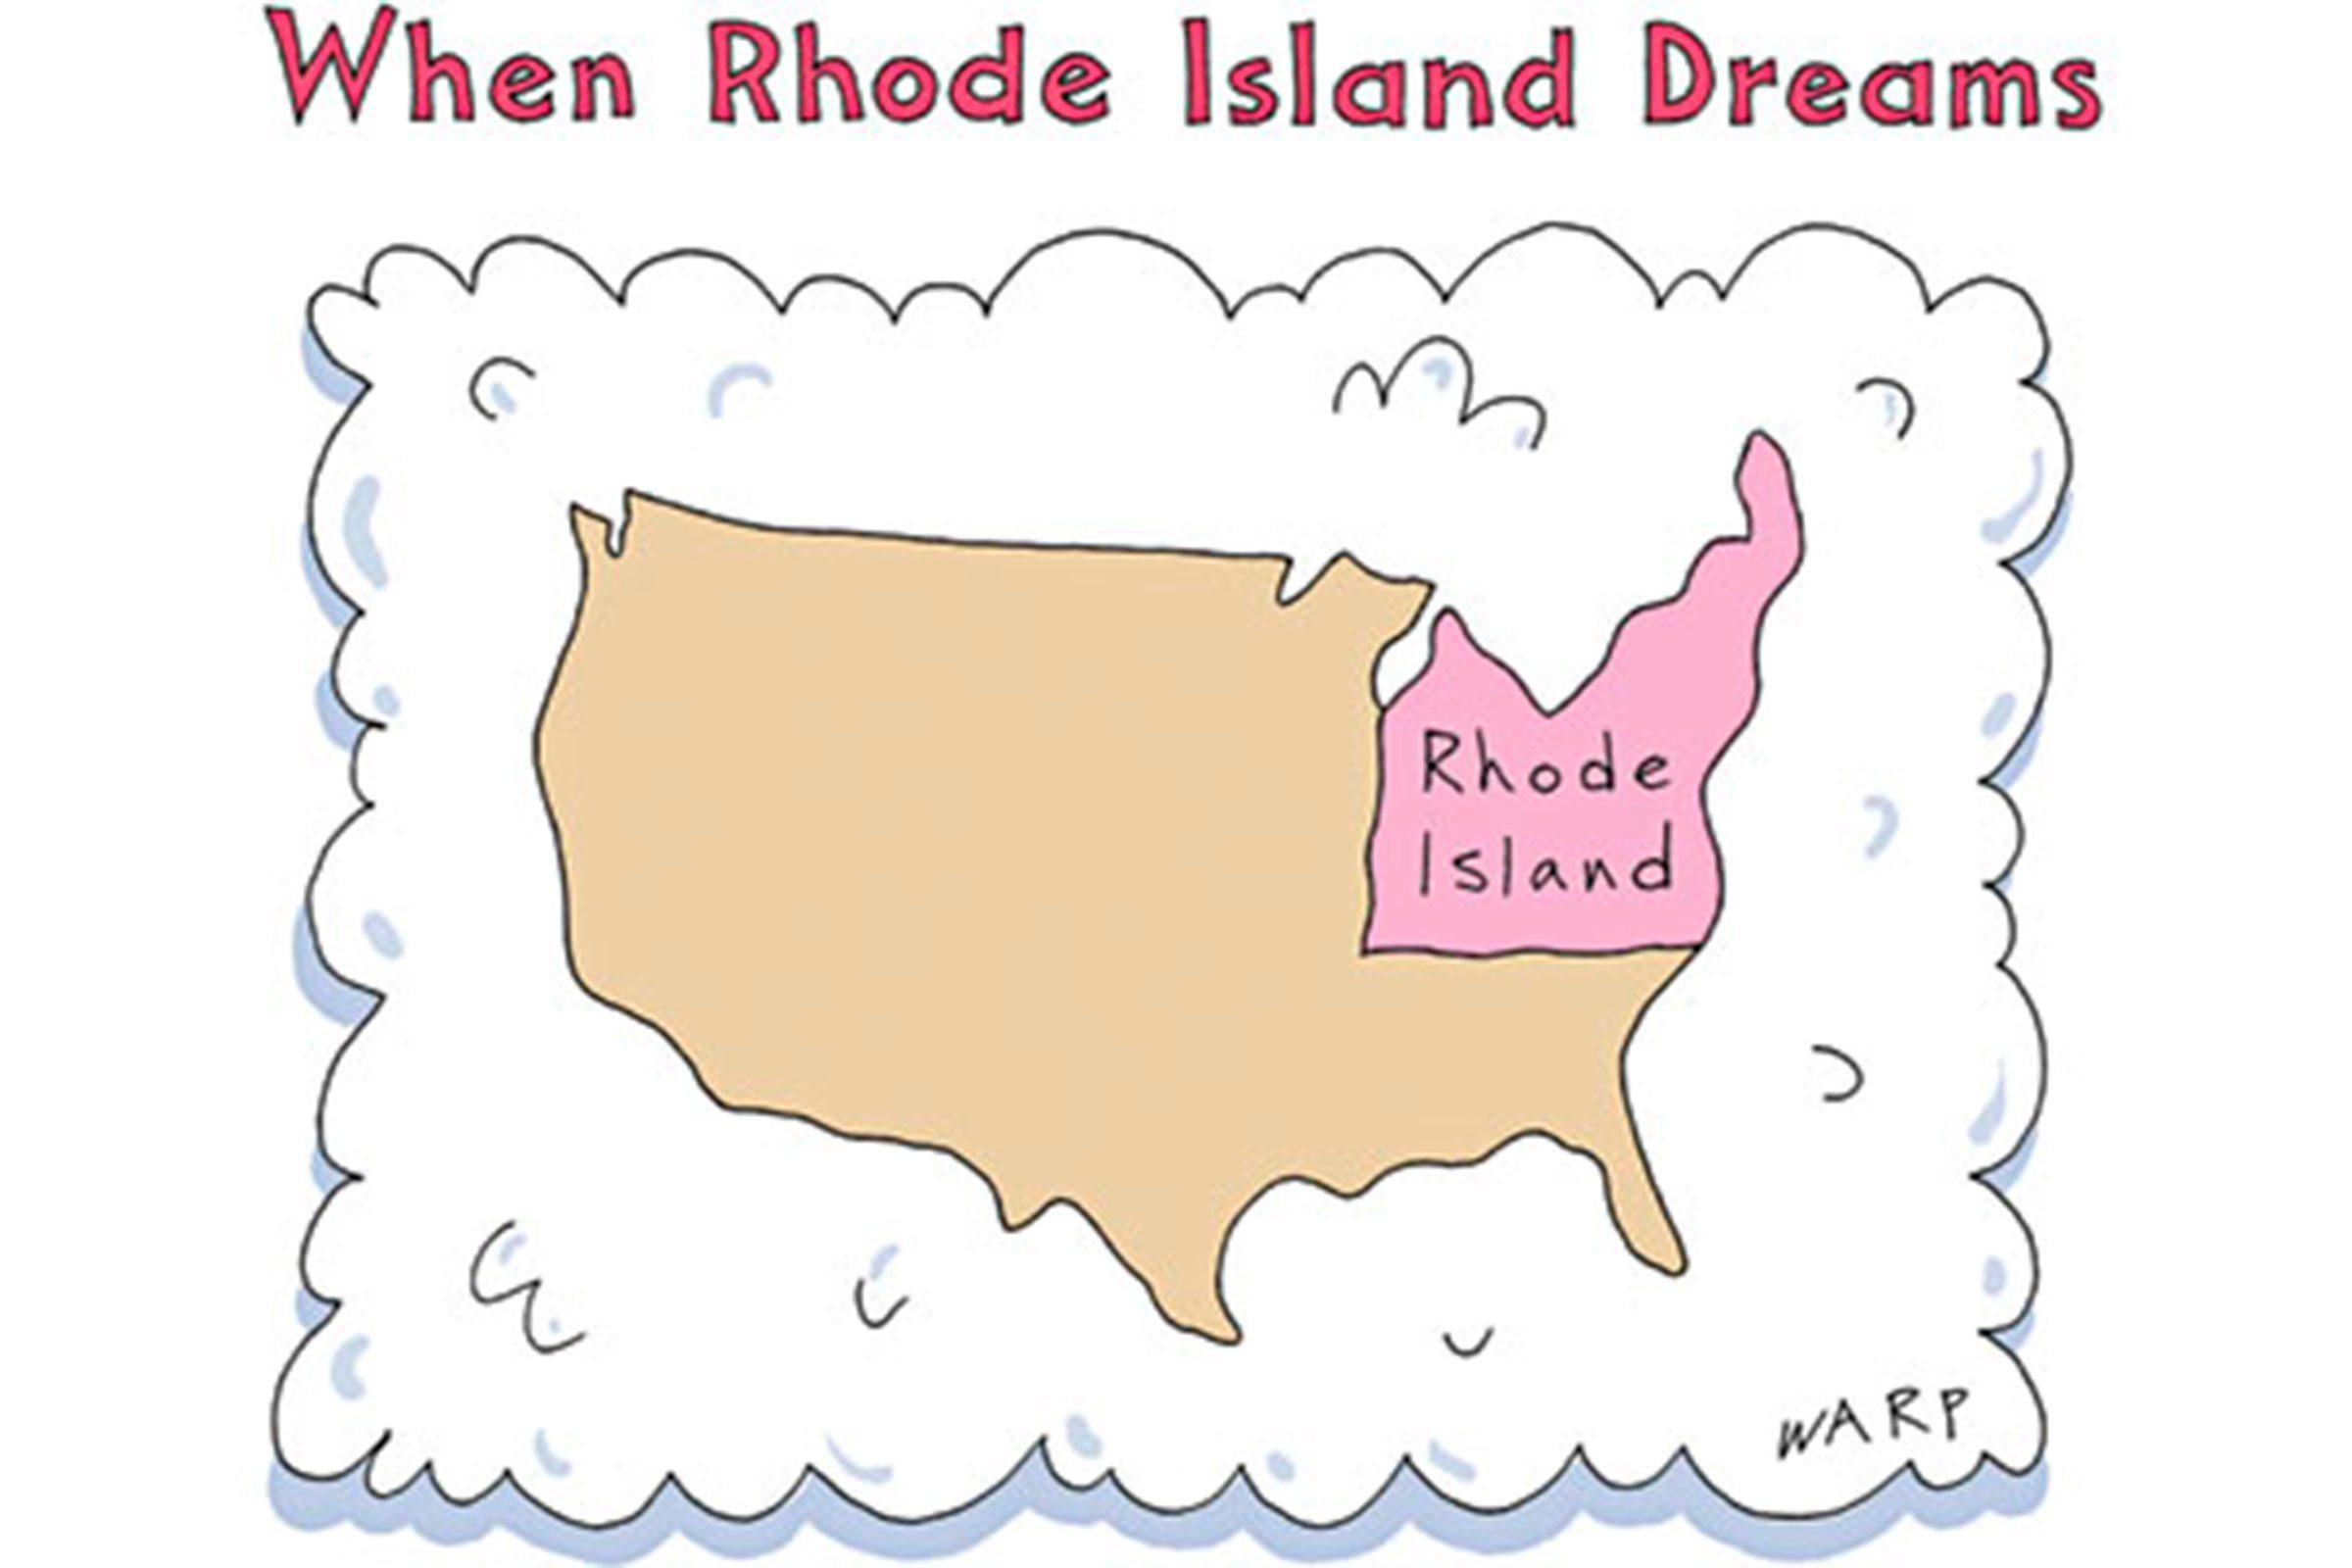 Welcome to: Rhode Island